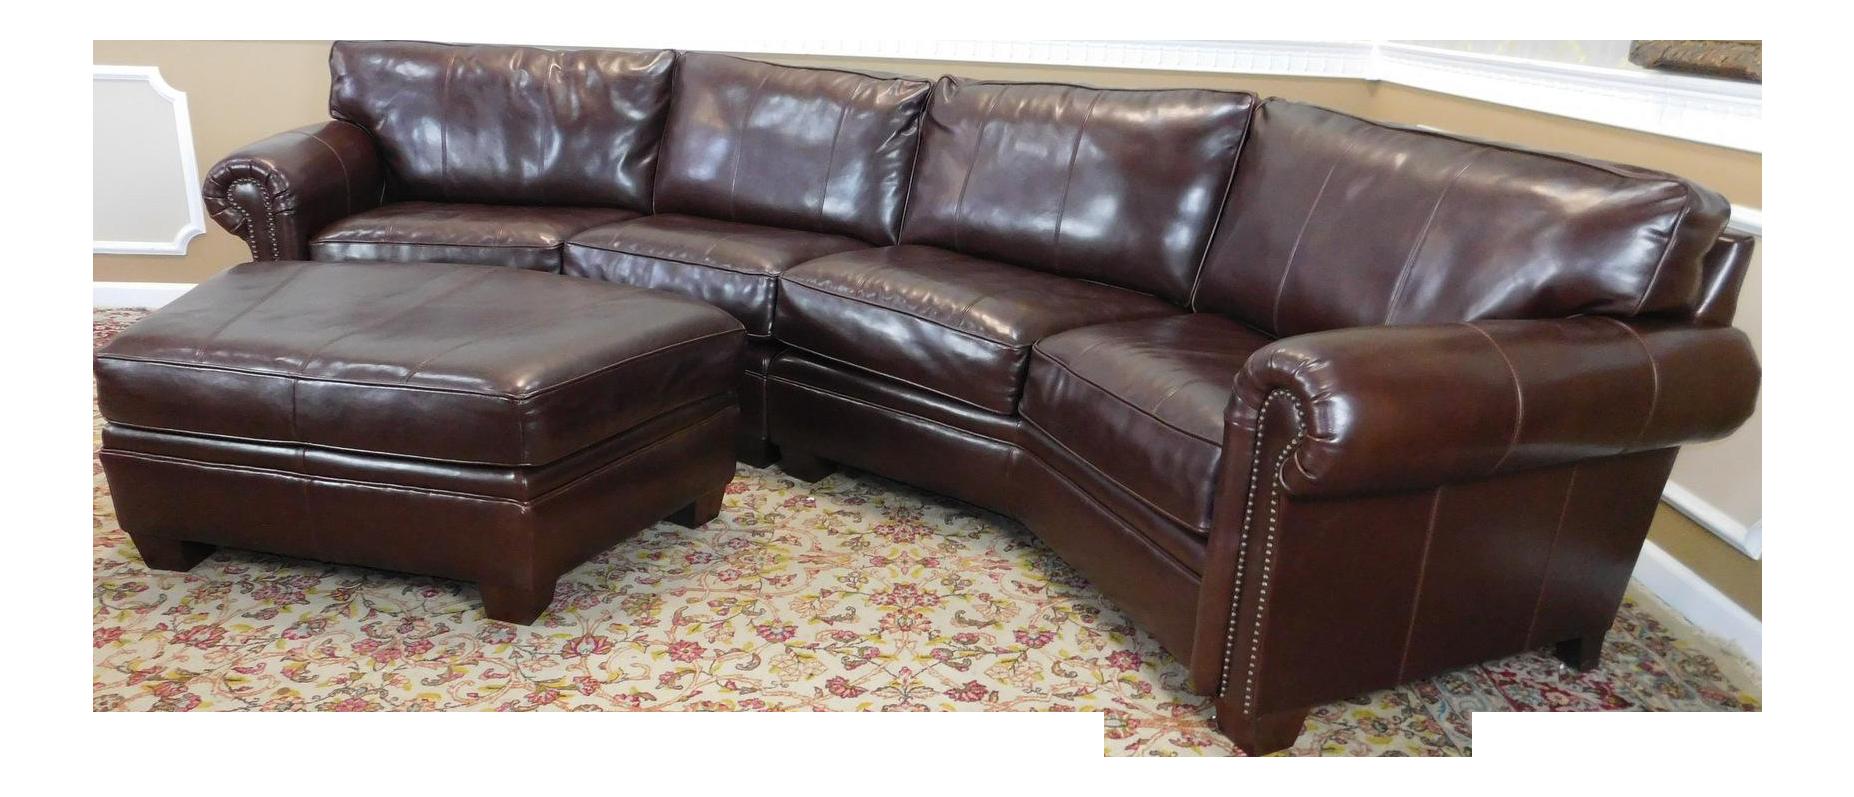 3 Piece Bernhardt Brown Leather Sectional Sofa Ottoman Chairish